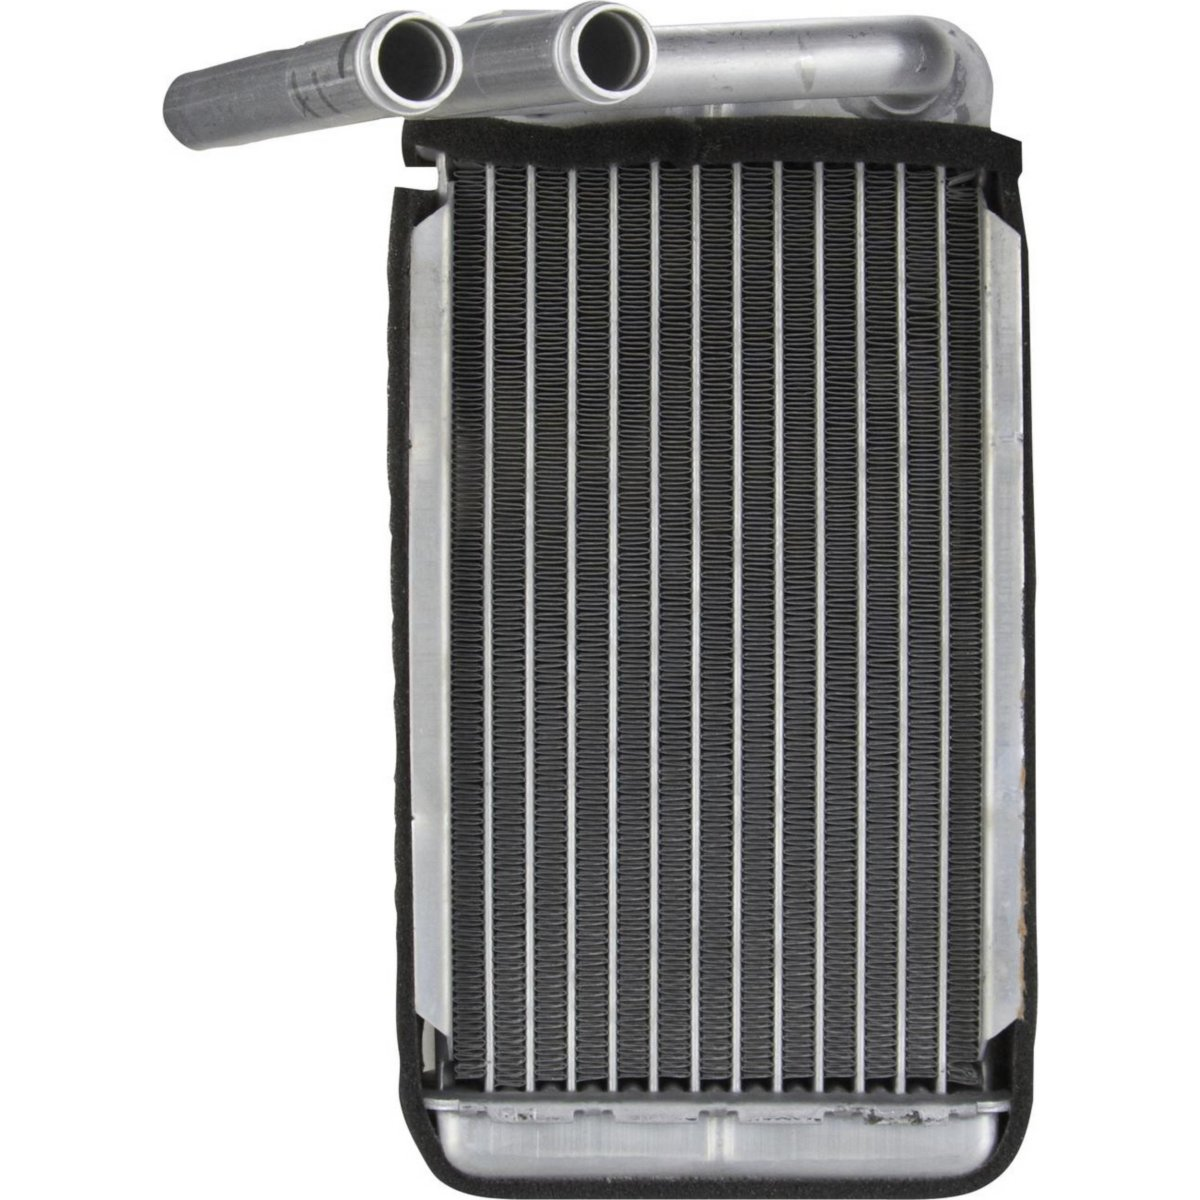 Spectra 94750 Heater Core New Acura Integra For Honda